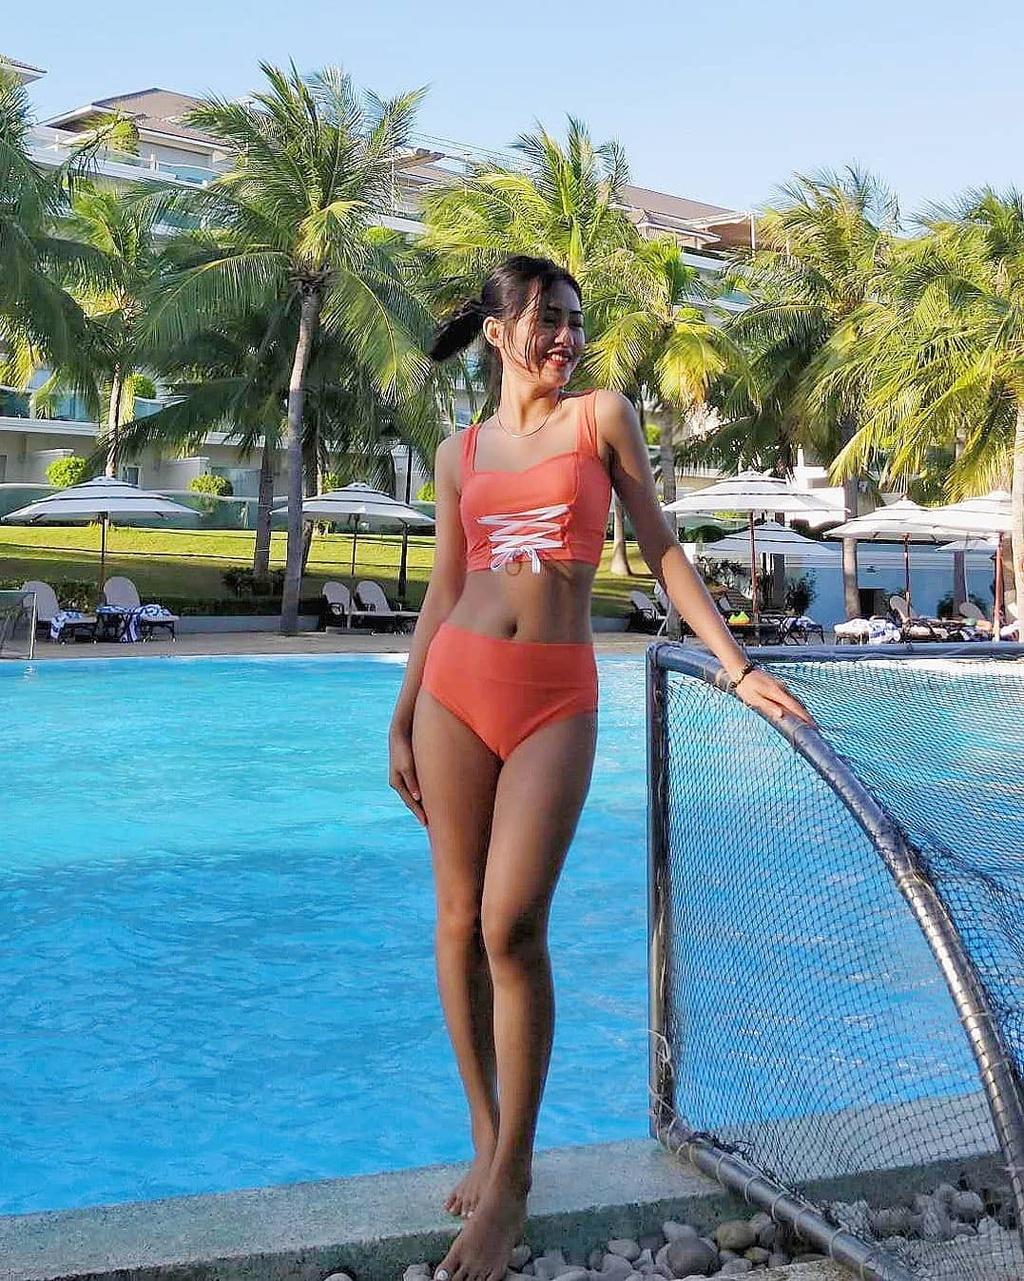 Tan huong ky nghi o 5 resort sang chanh Mui Ne hinh anh 13 4_linglingling0627.jpg